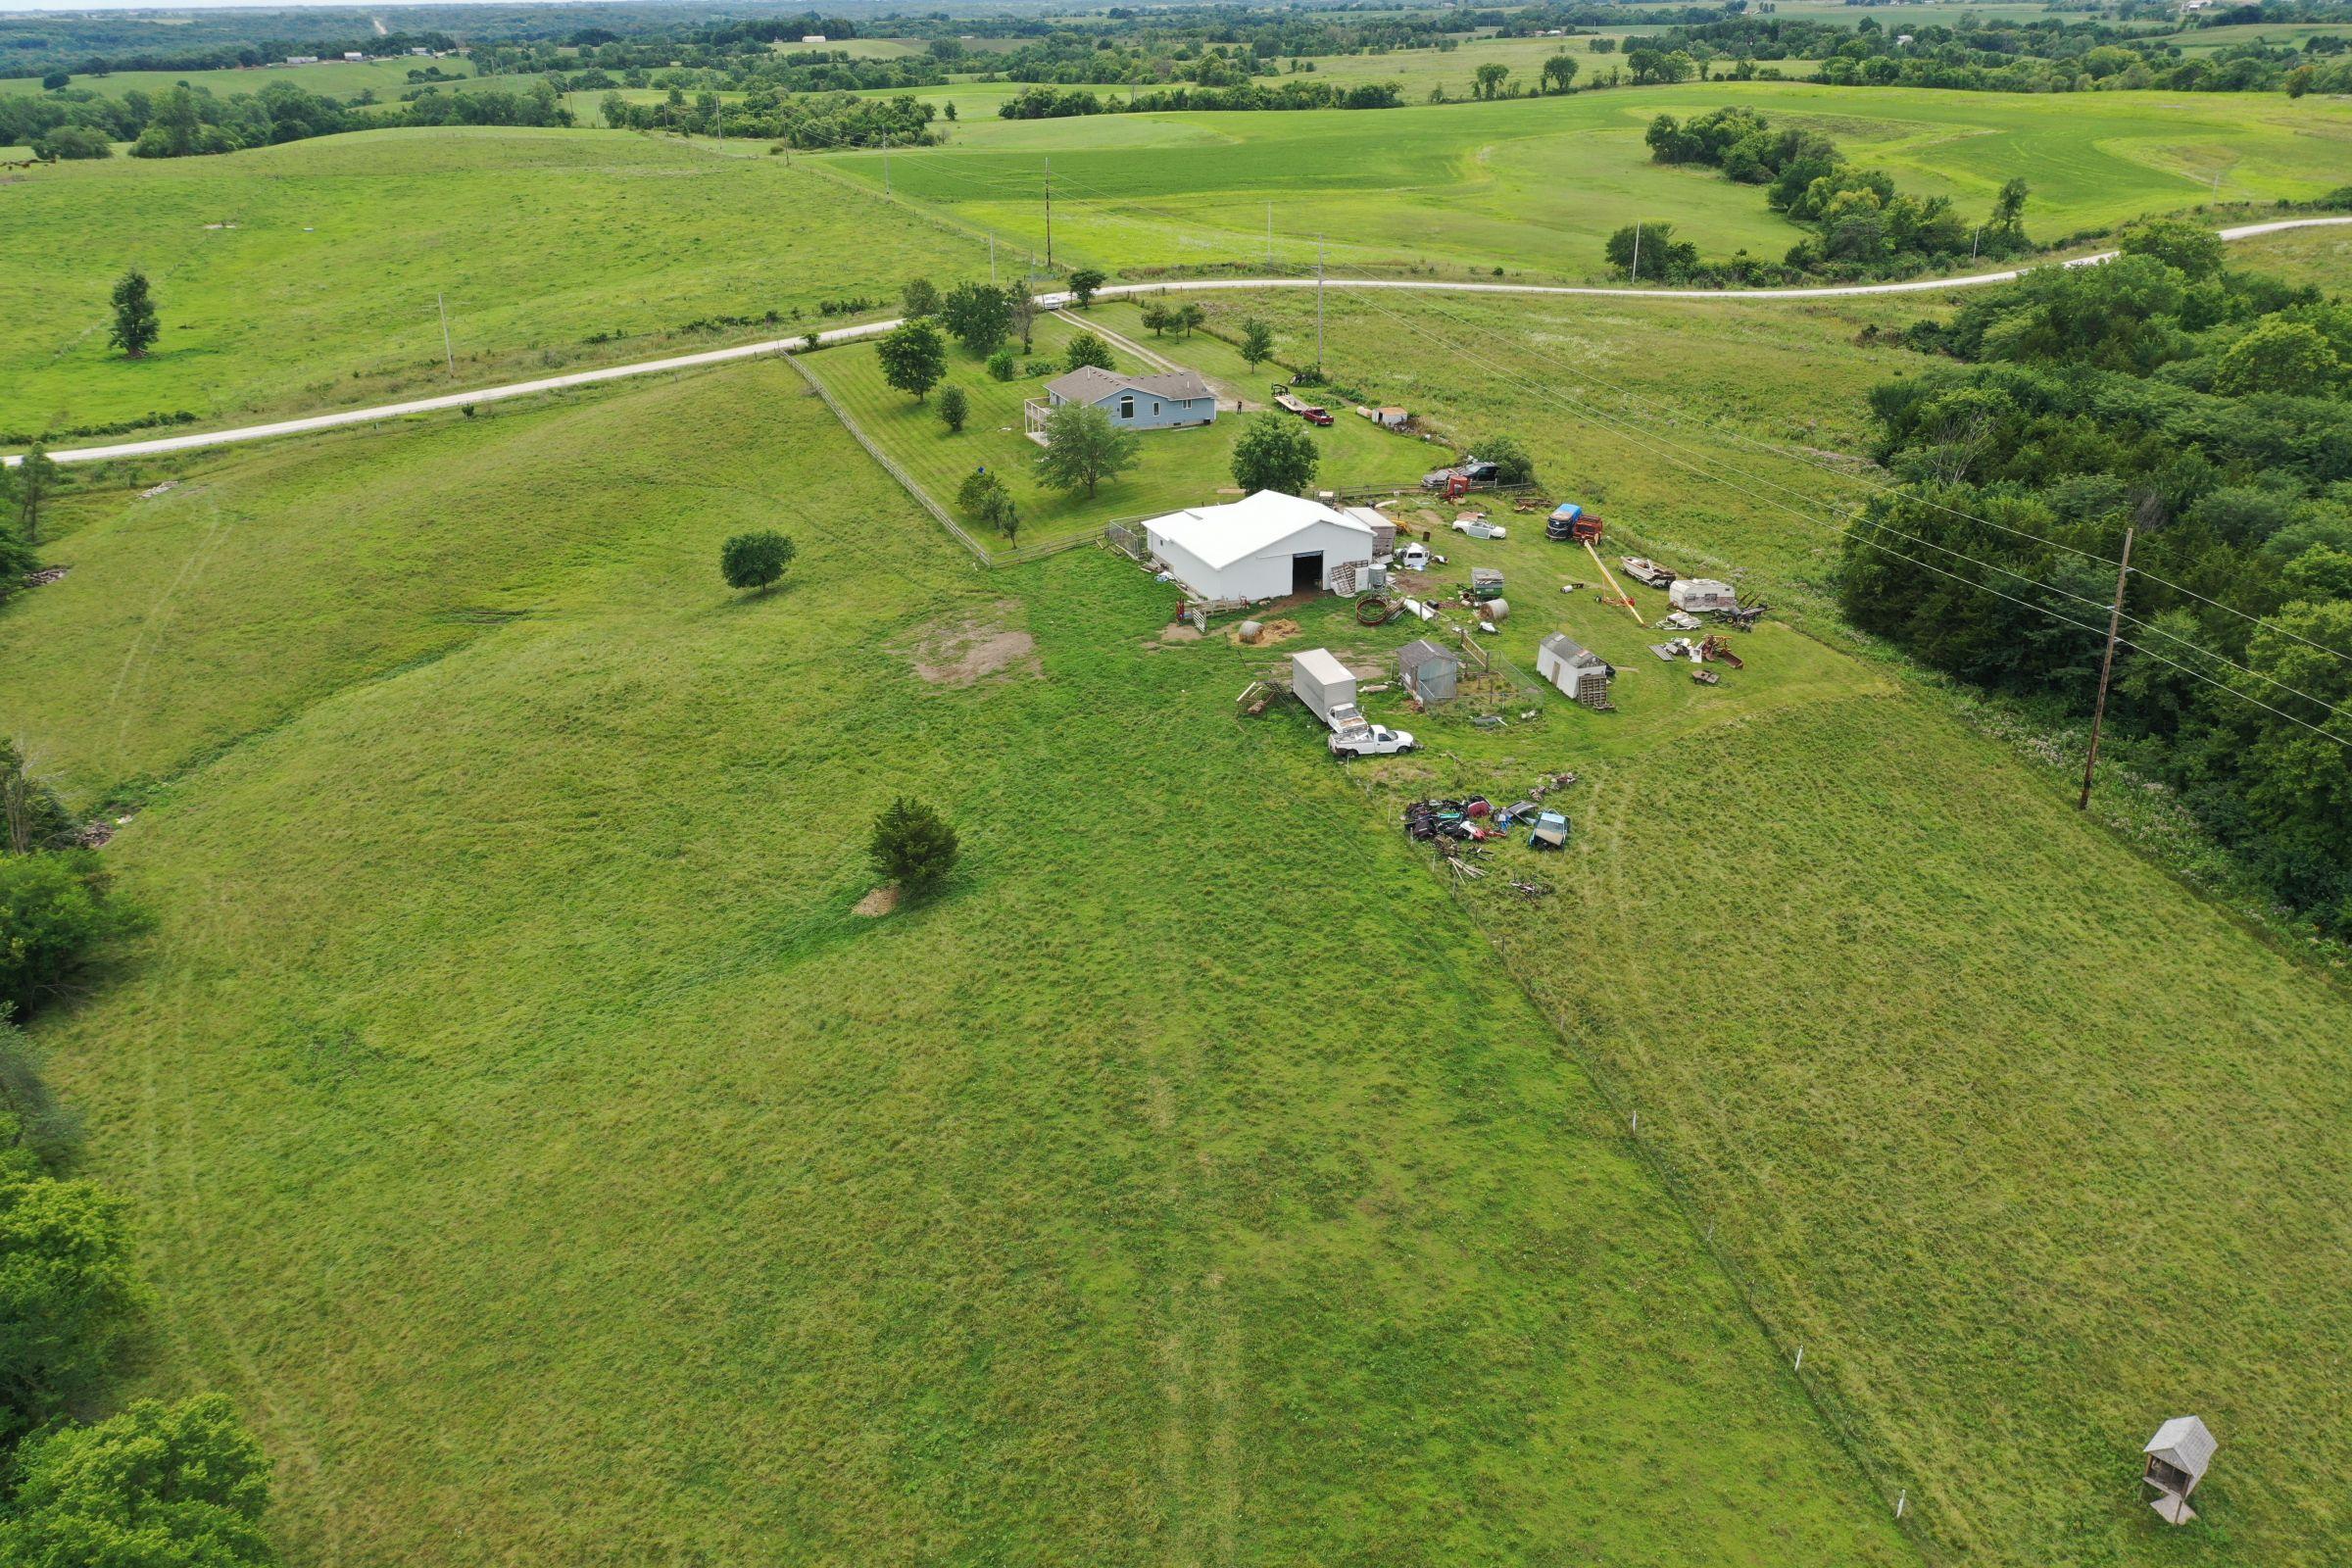 residential-warren-county-iowa-12-acres-listing-number-15104-1-2020-08-08-184614.jpg